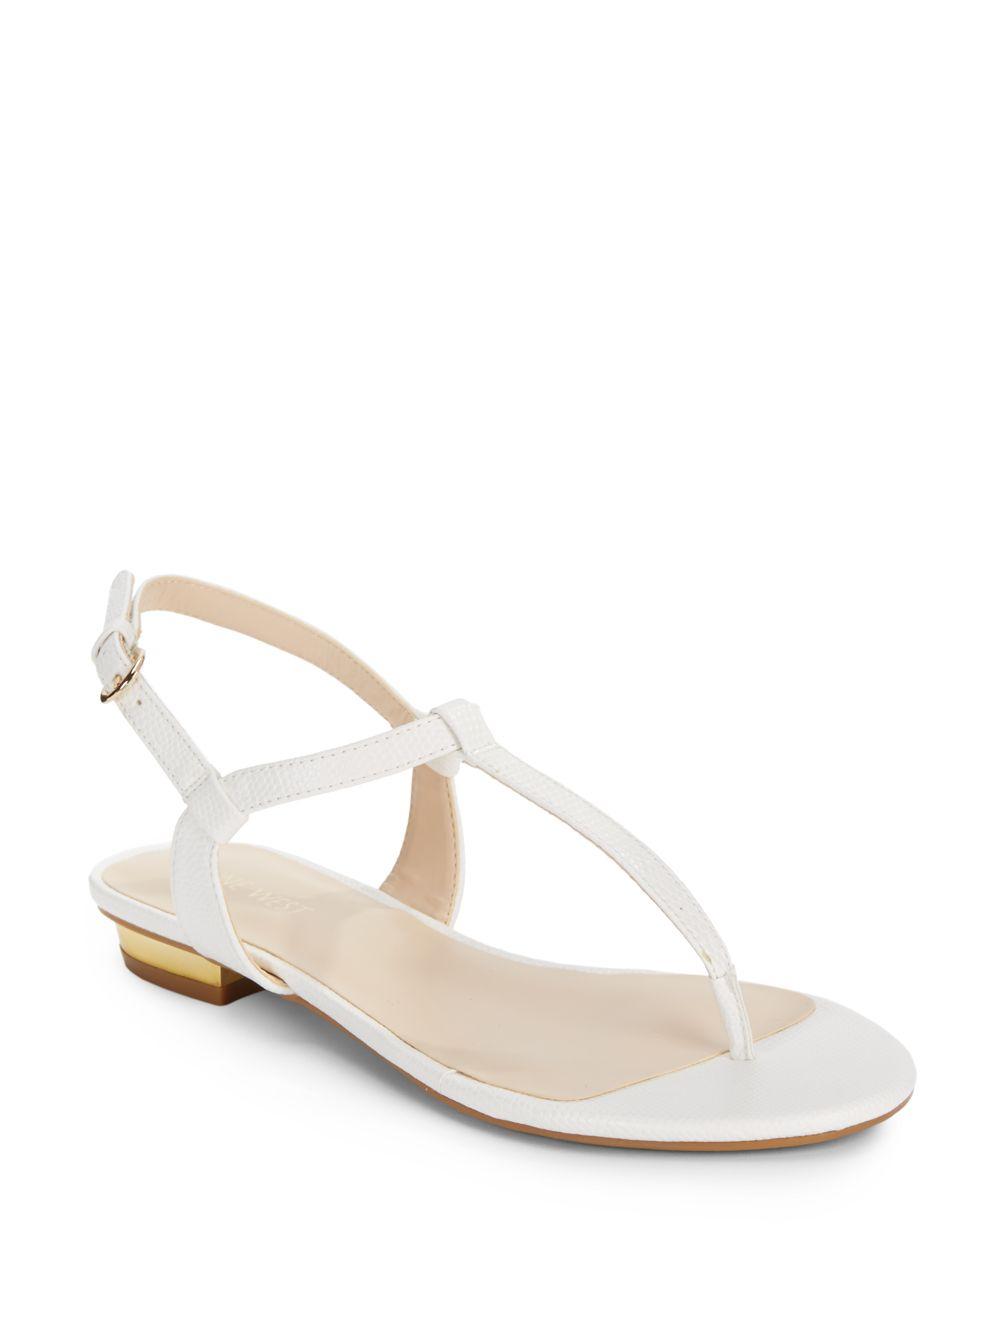 658f23669f96ea Lyst - Nine West Unlock Faux Snakeskin T-Strap Thong Sandals in White